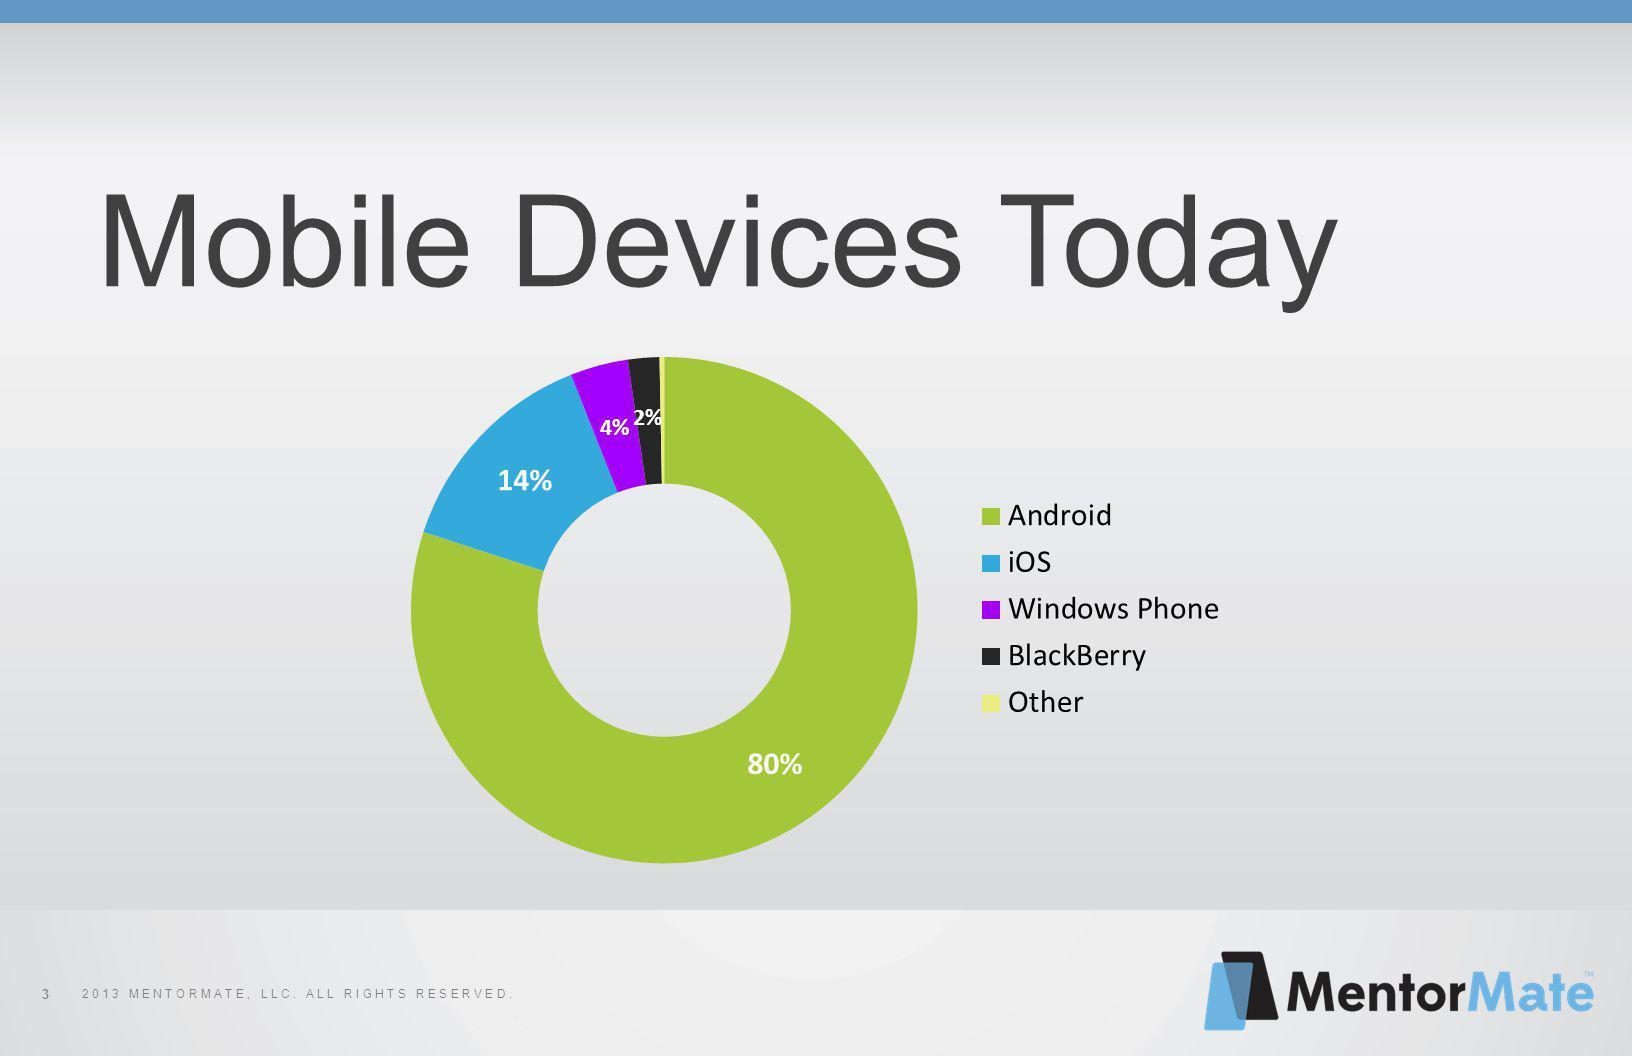 2 0 1 3 M E N T O R M A T E, L L C. A L L R I G H T S R E S E R V E D. 3 Mobile Devices Today